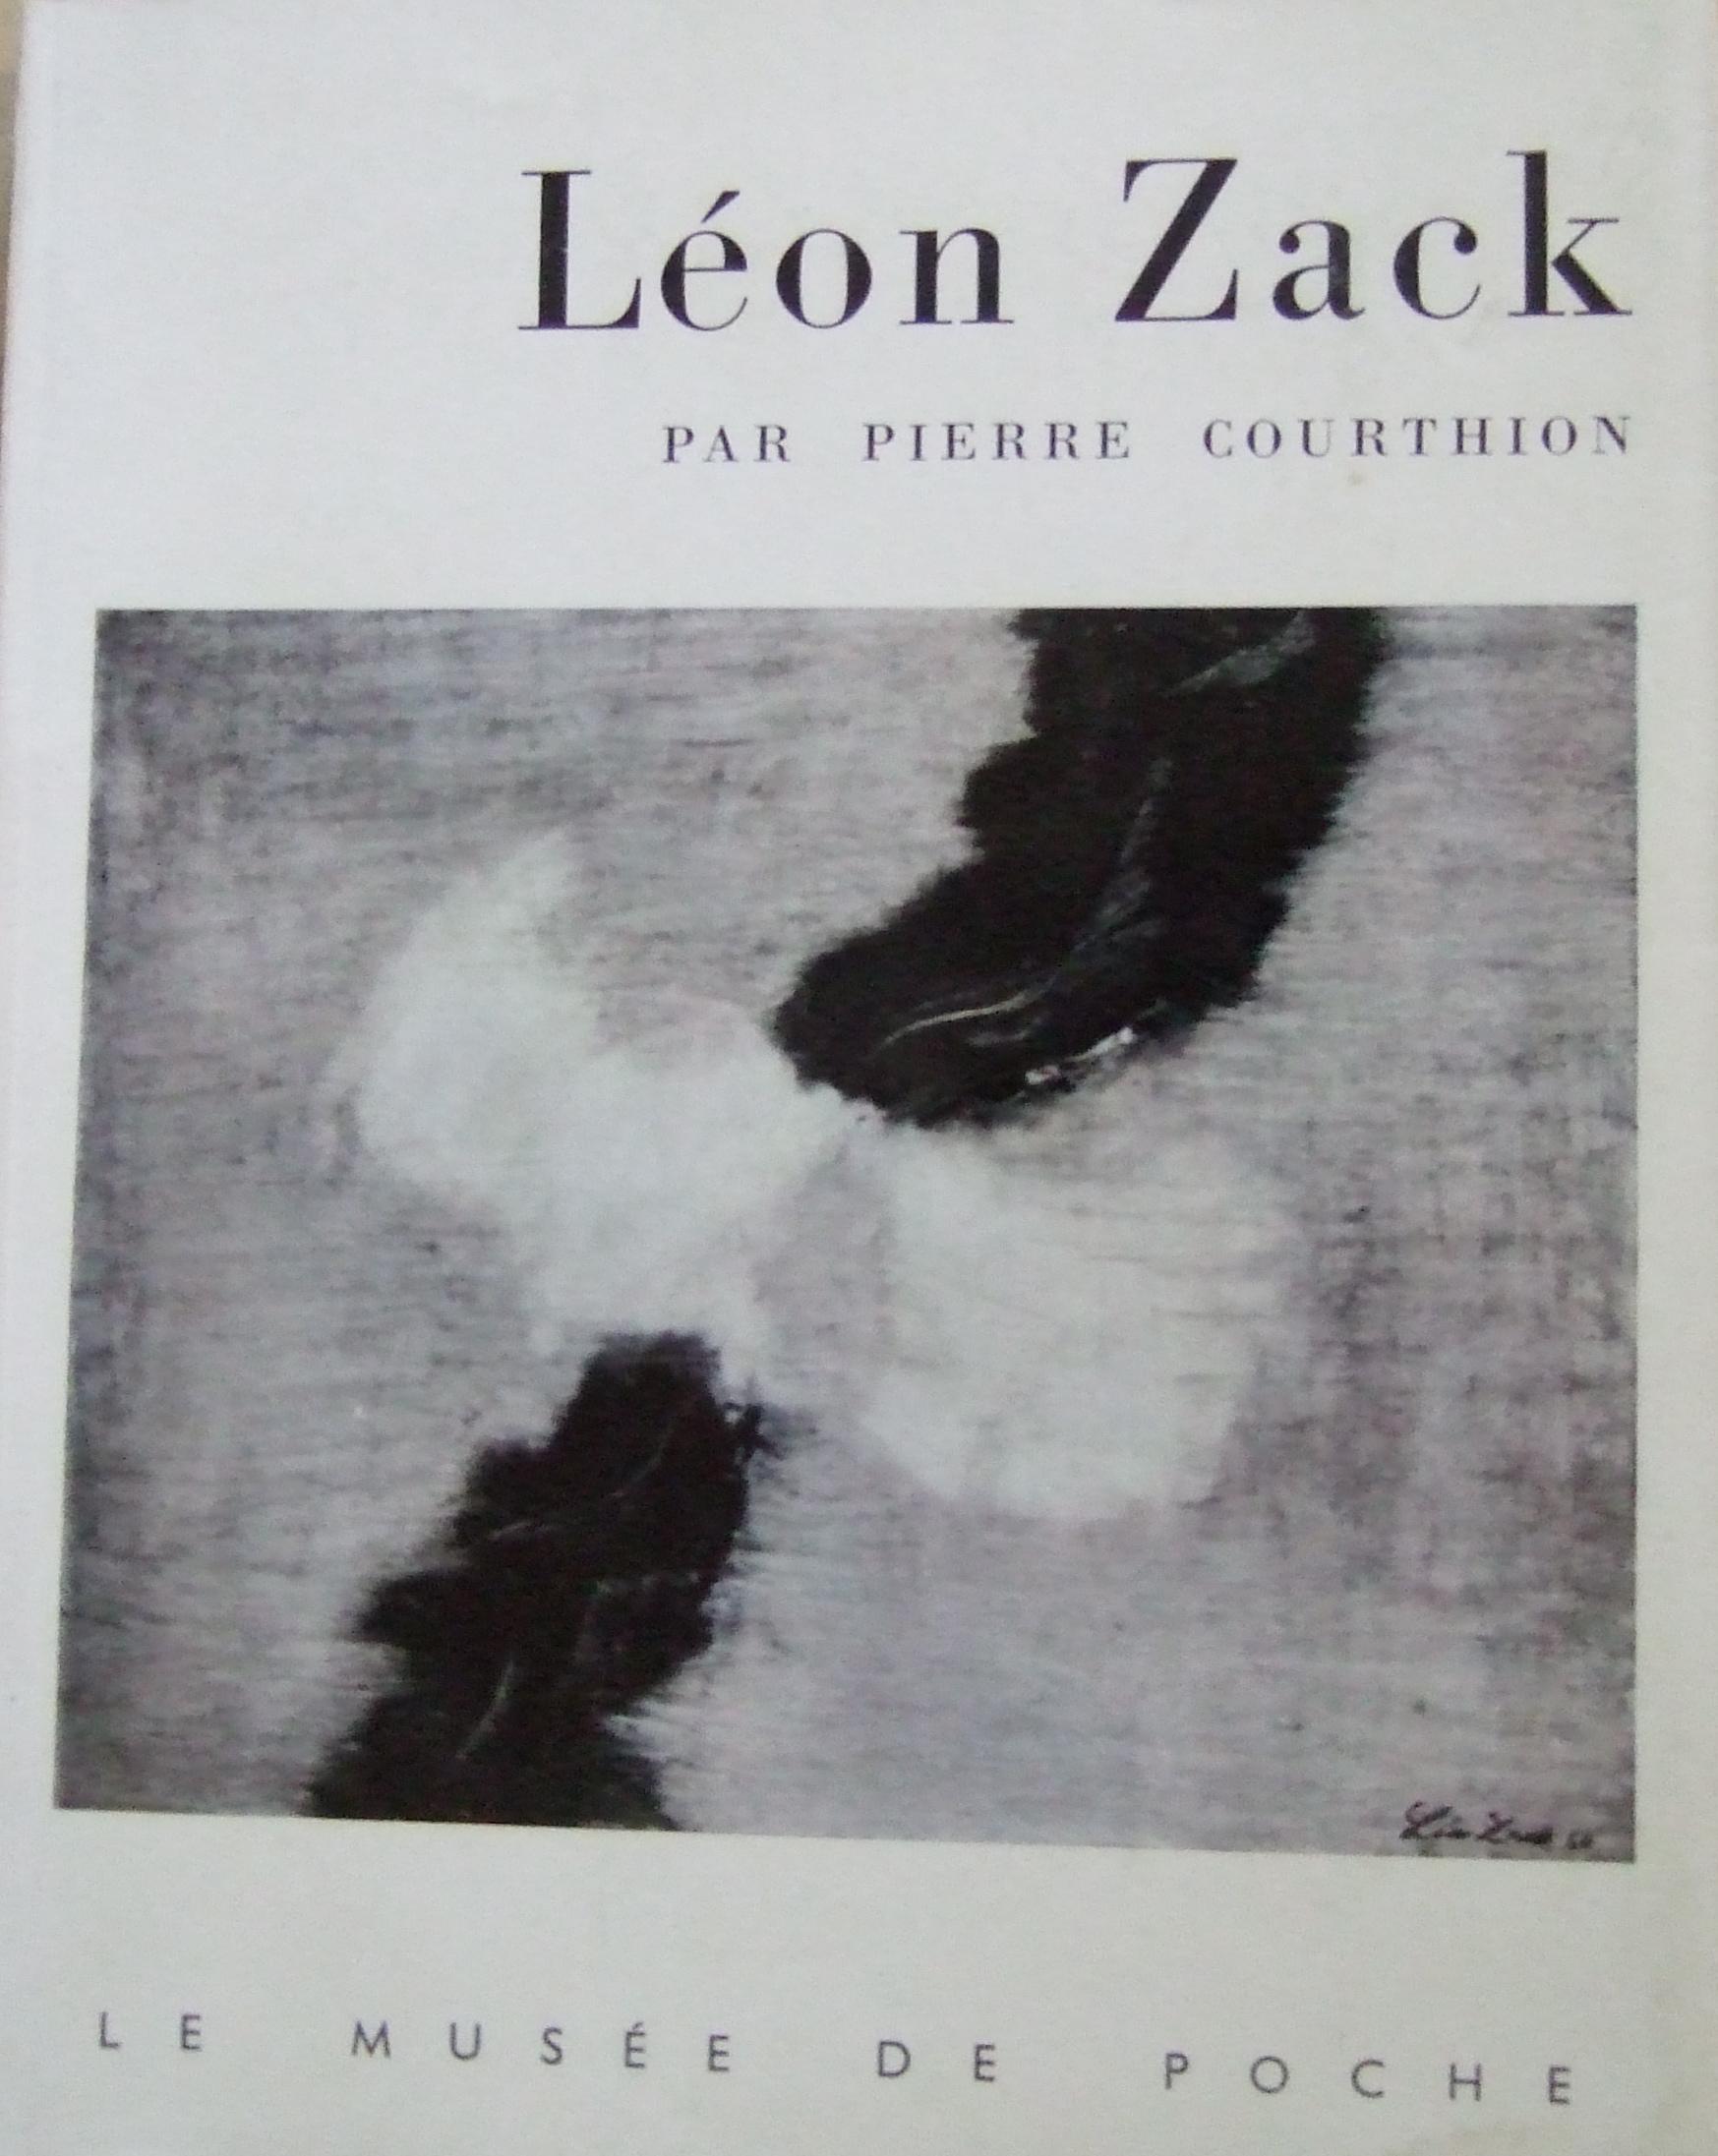 Leon Zack  By Pierre Courthion. 1961